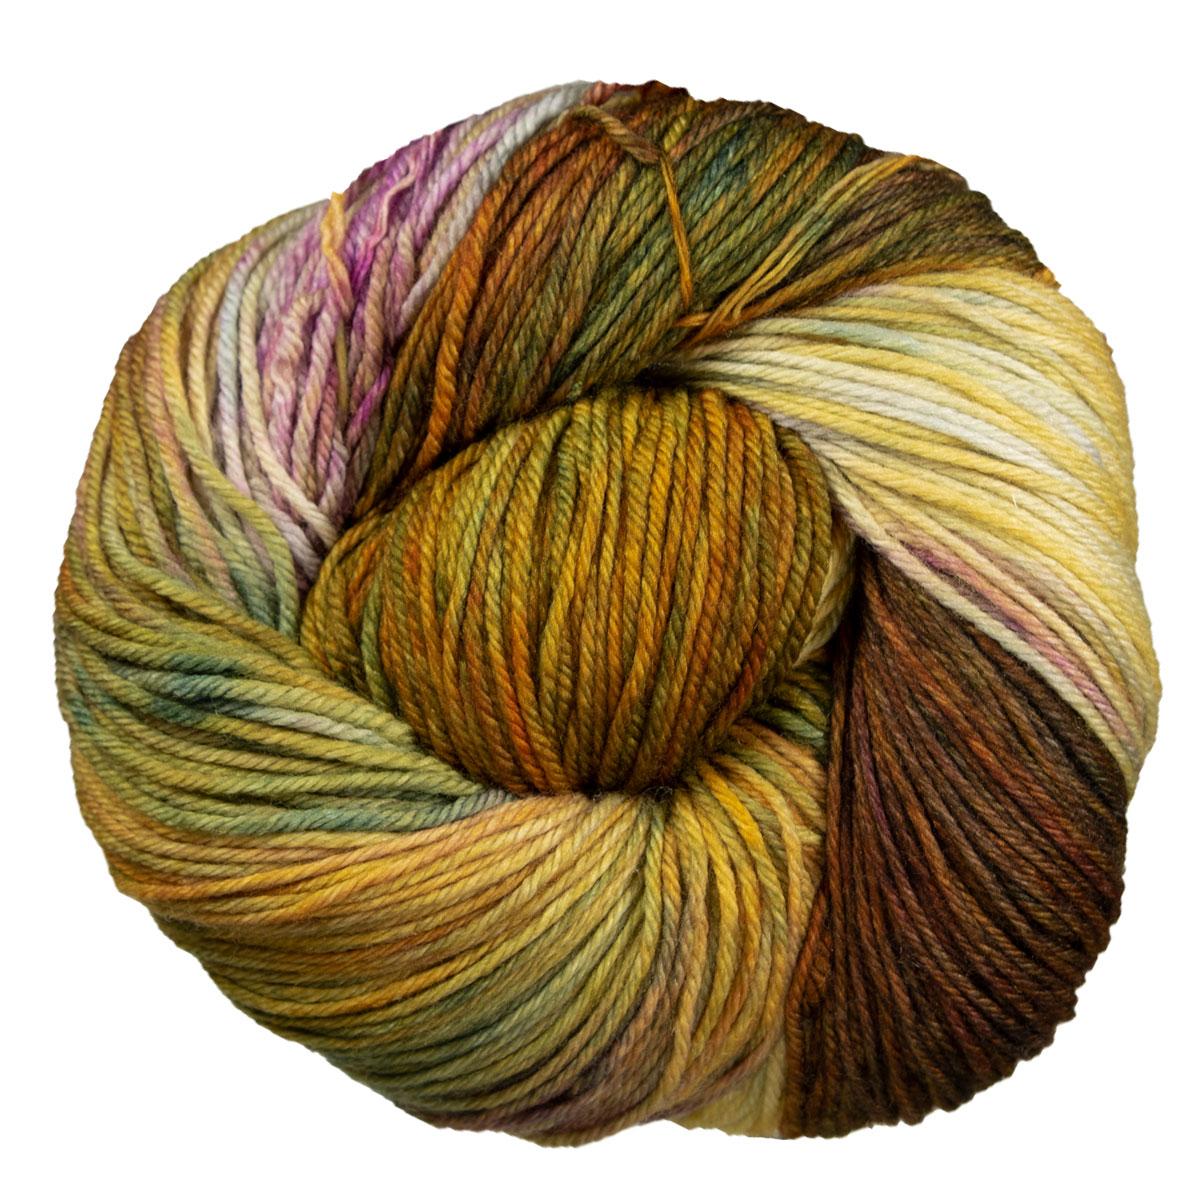 Malabrigo Twist Merino Aran Yarn Wool 100g Azul Profundo 150